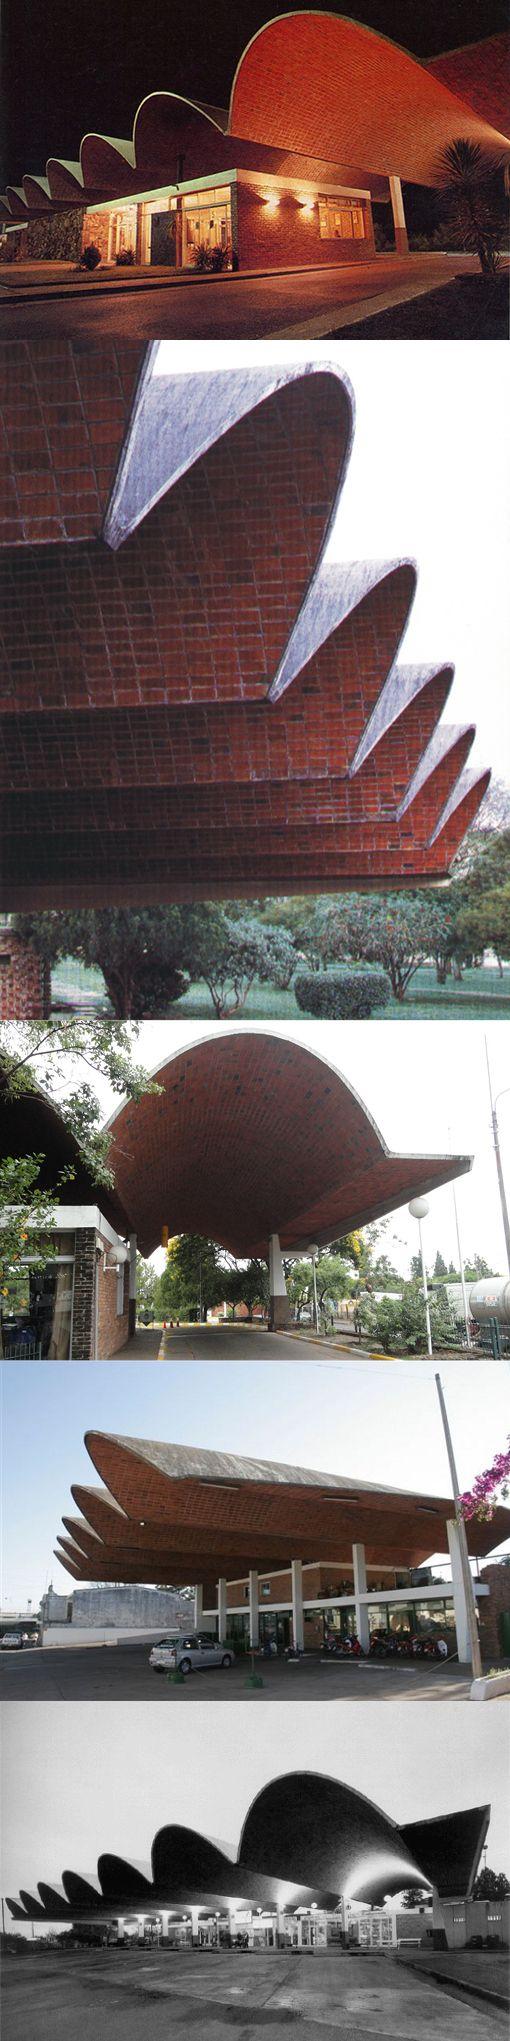 1974 Eladio Dieste (1917-2000) - Salto Bus Terminal / Uruquay / brick